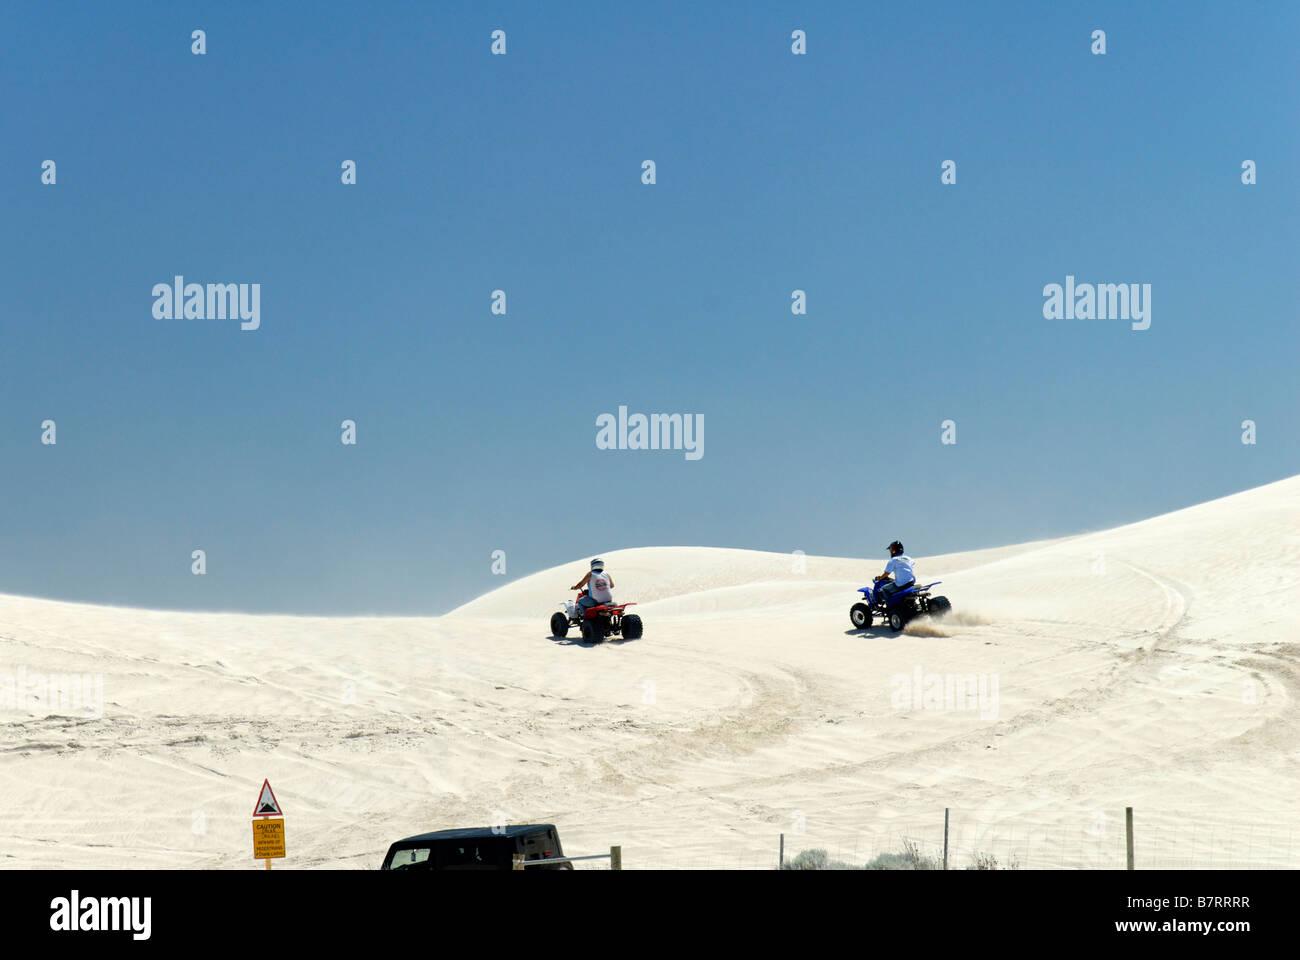 Quad bikes on sand dunes outdoor leisure activities summer Western Australia - Stock Image